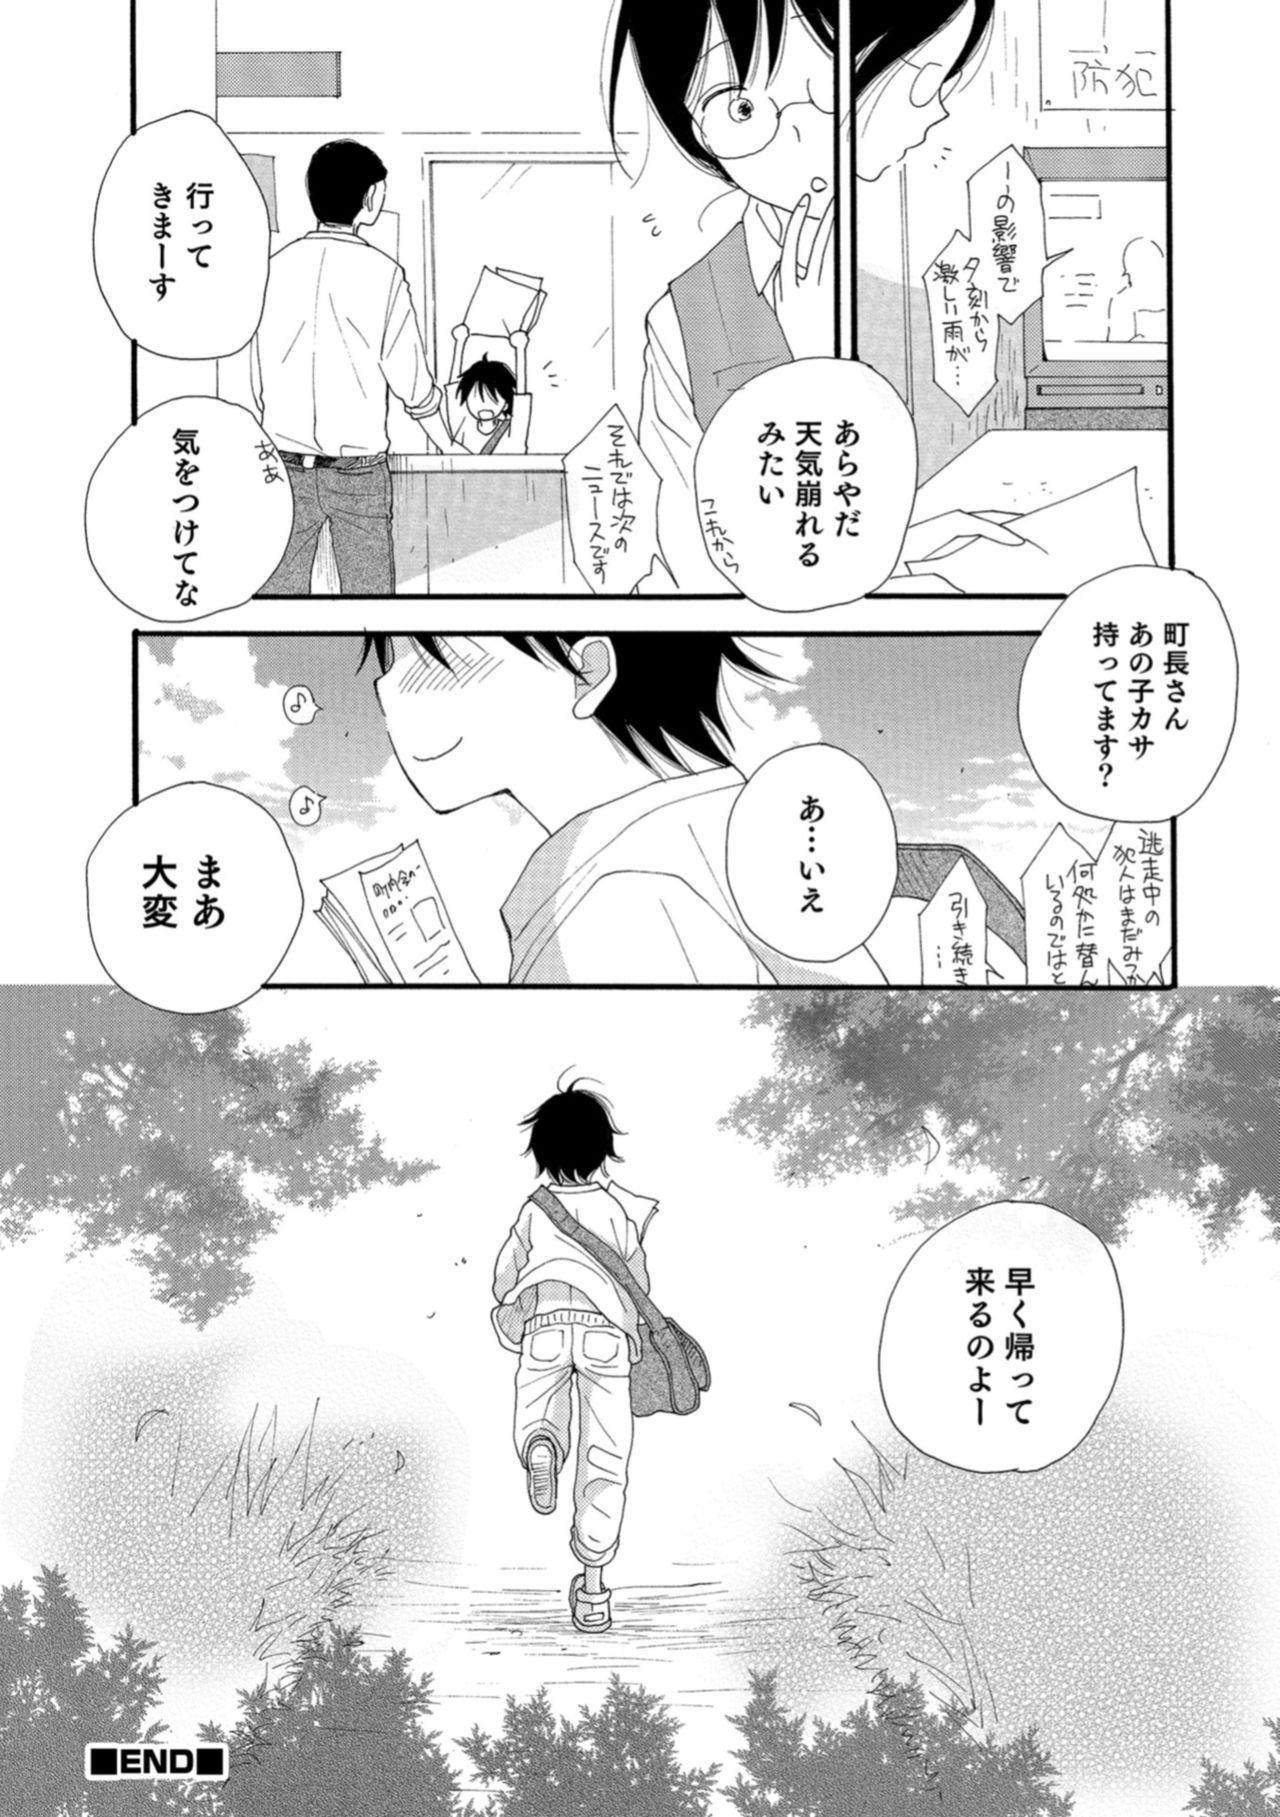 Otokonoko HELL'S GATE #03 153